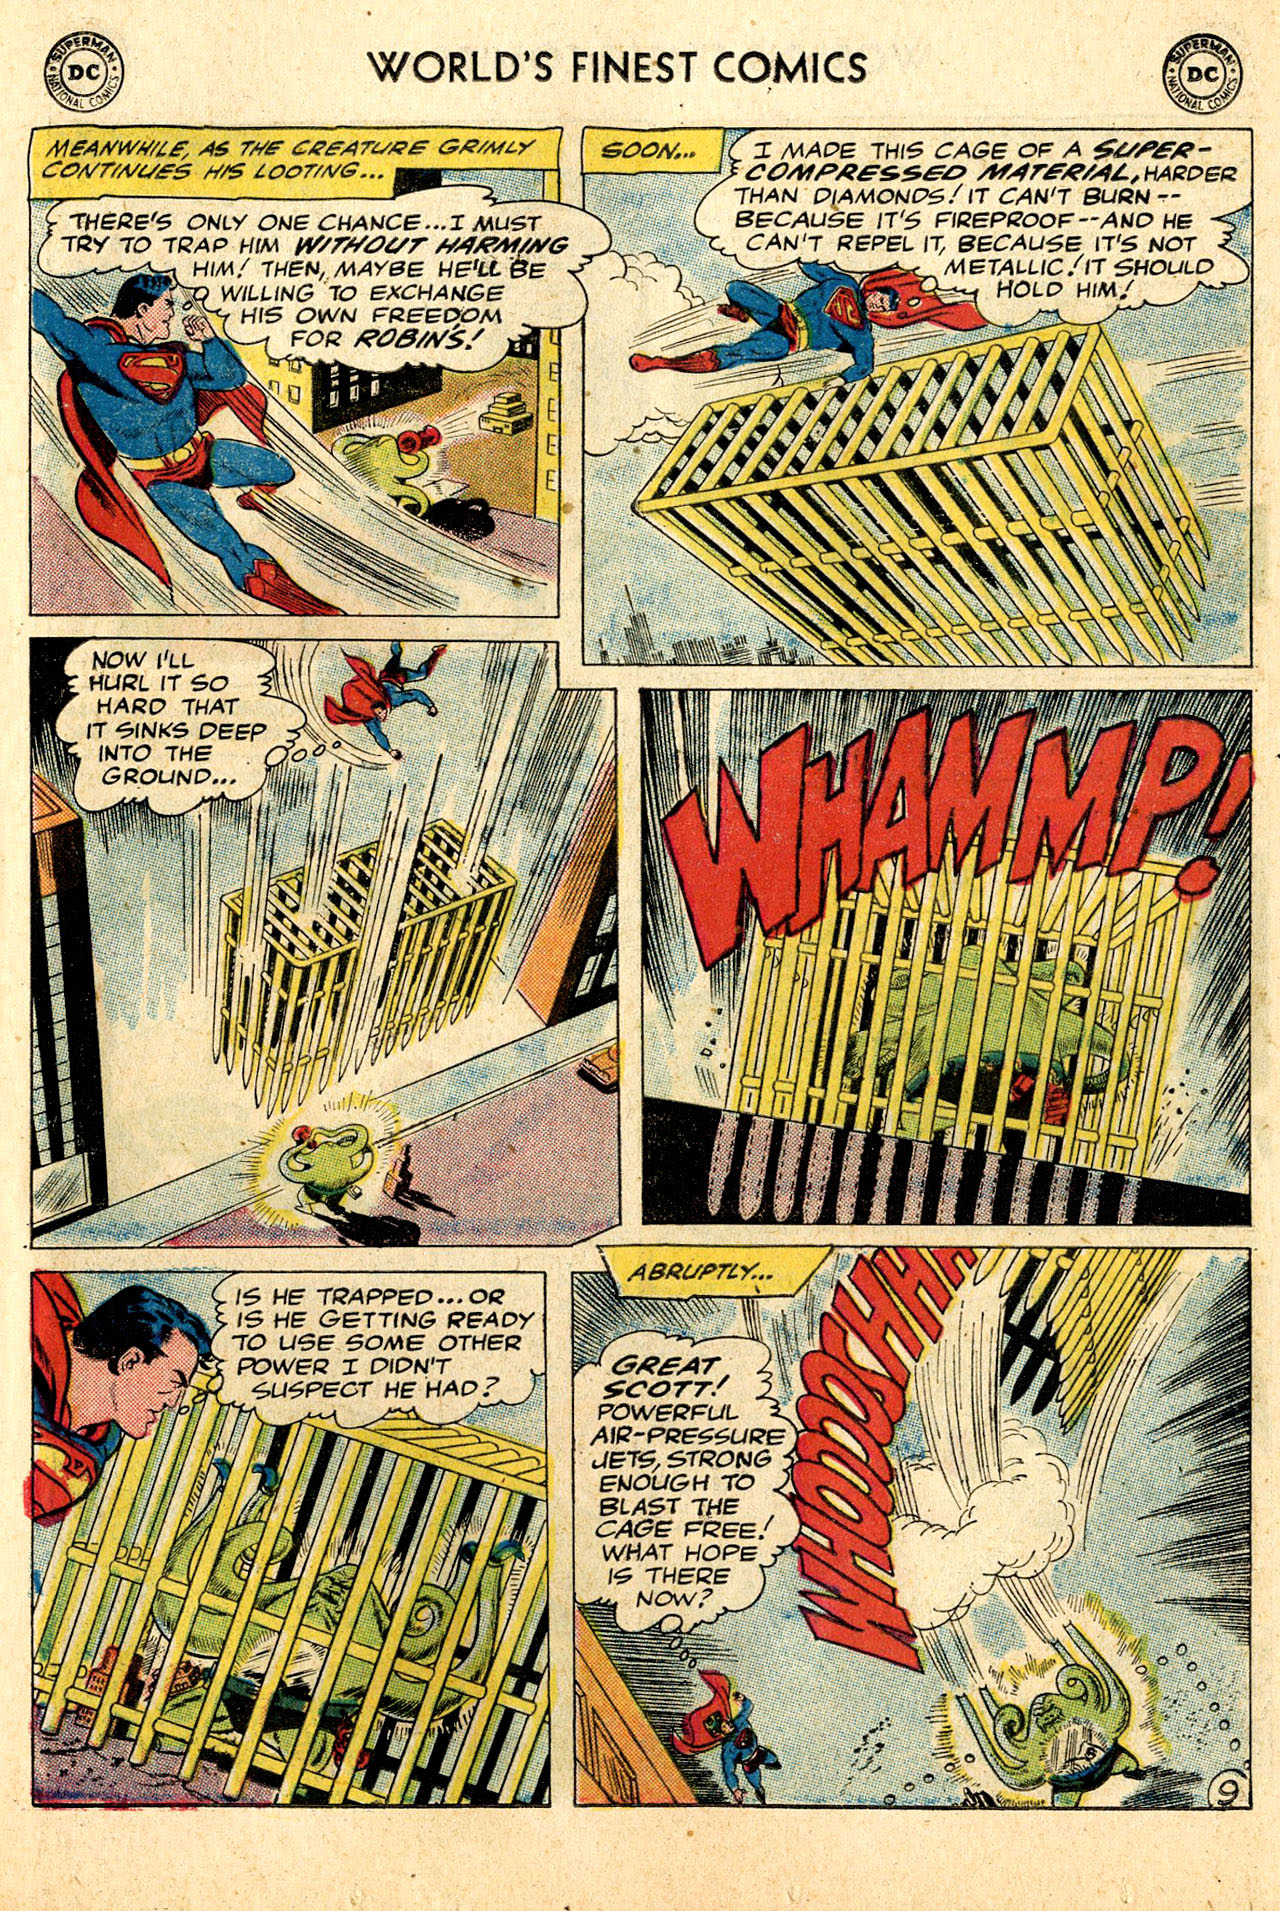 Read online World's Finest Comics comic -  Issue #110 - 11